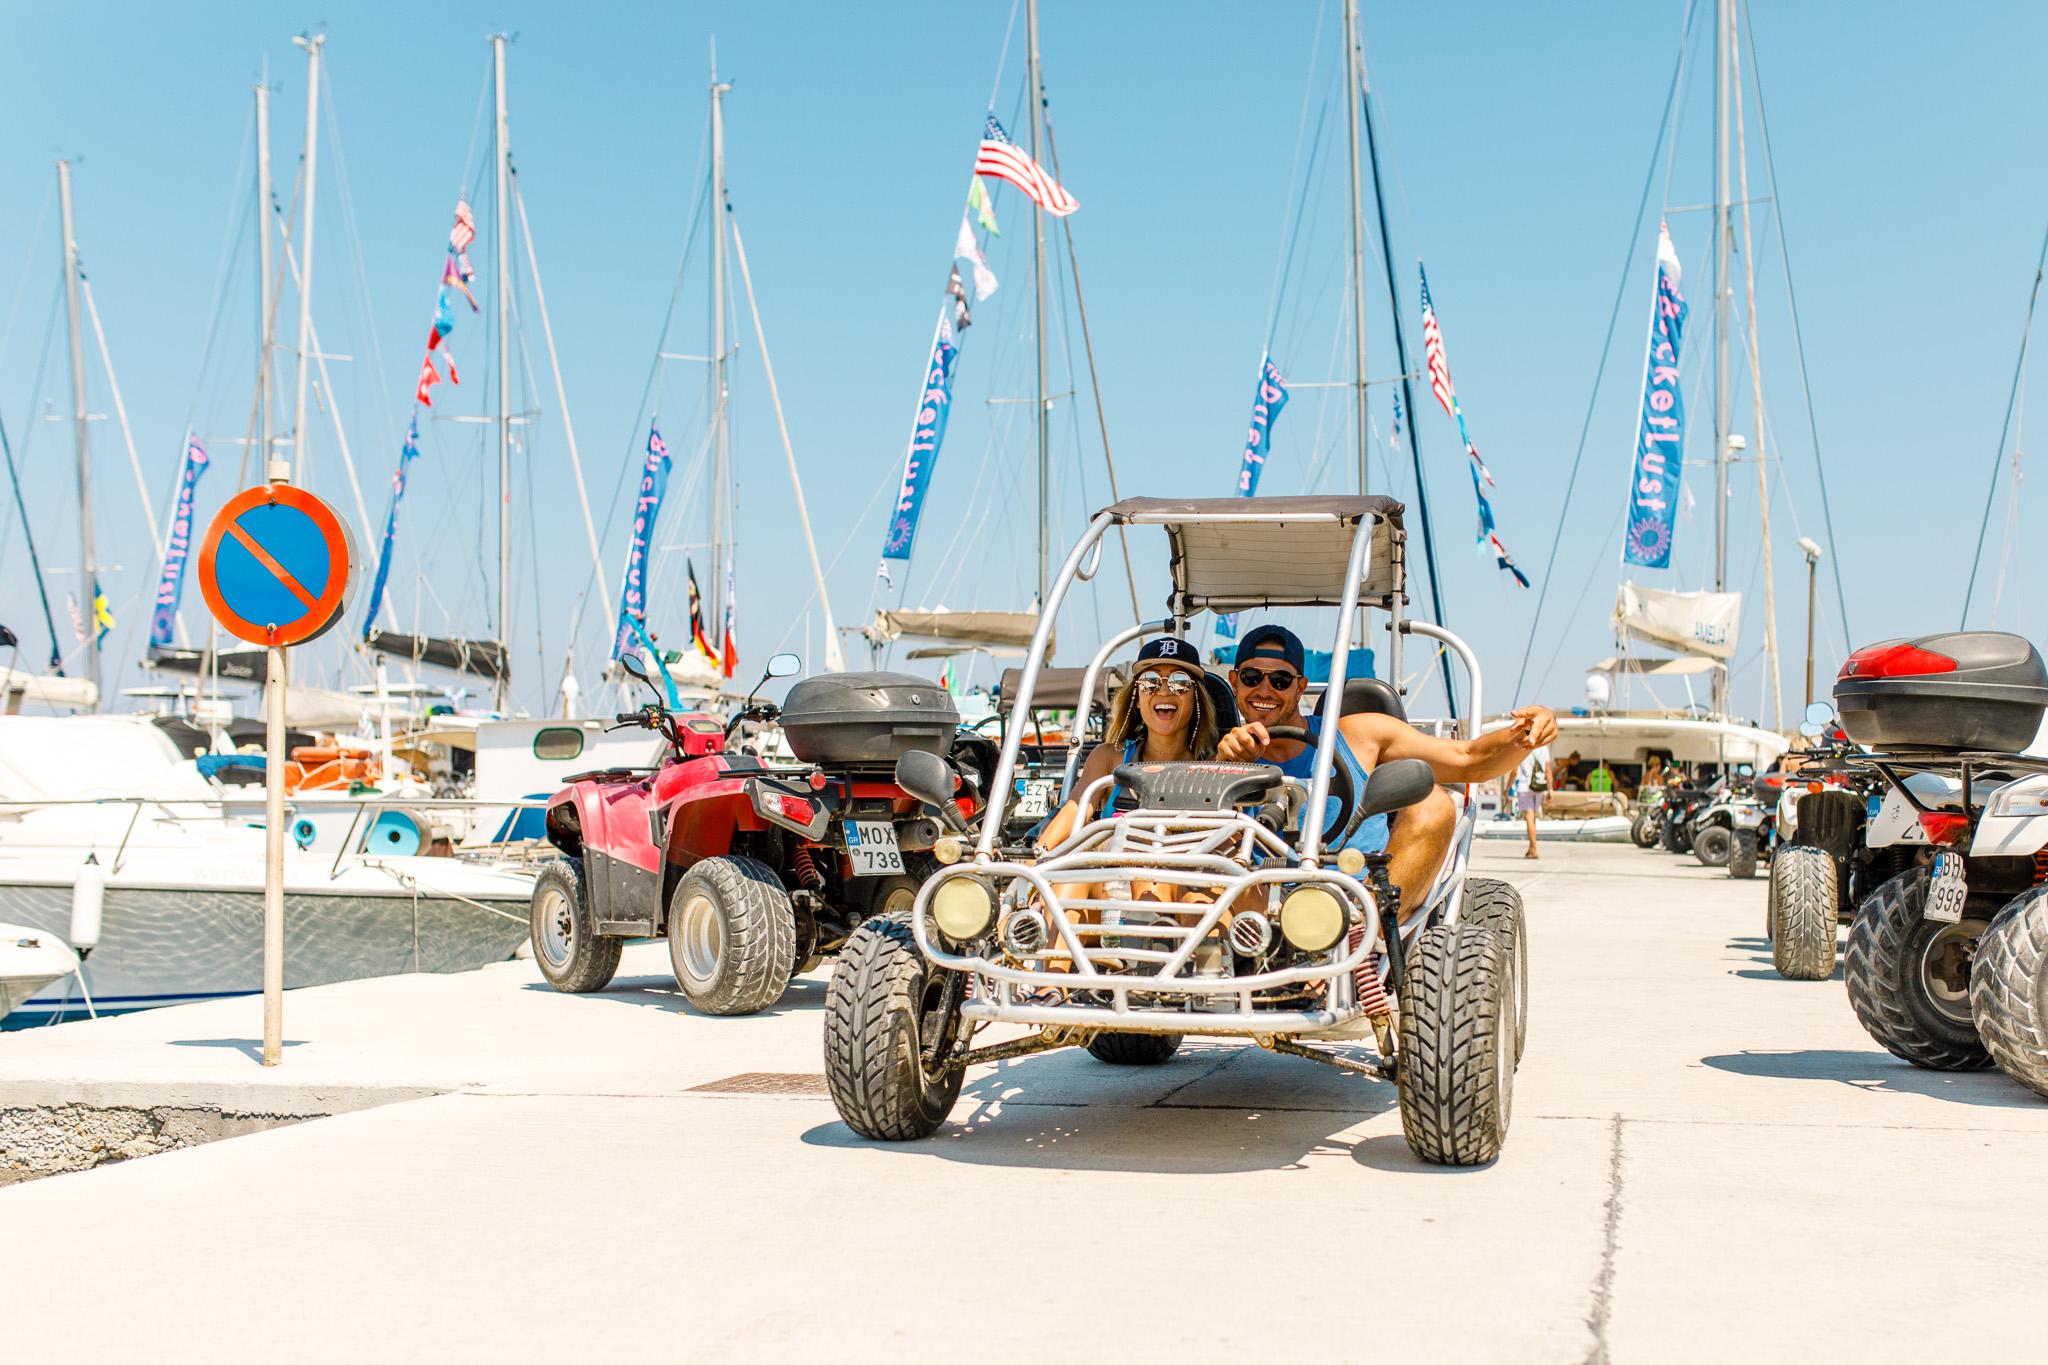 Yachts, ATVs & unicorns - The Mykonos Route